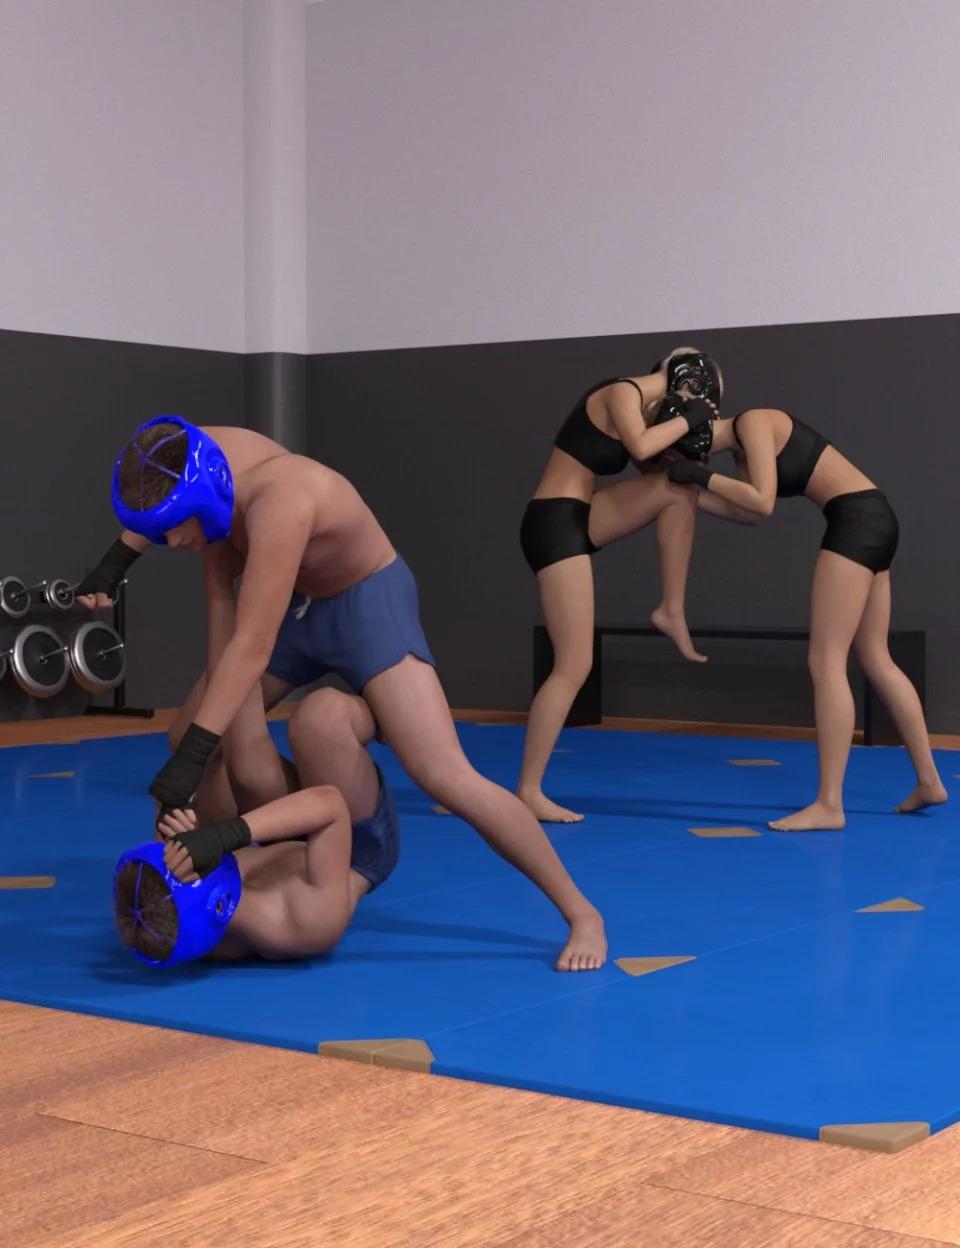 relentless-brawler-poses-for-genesis-8